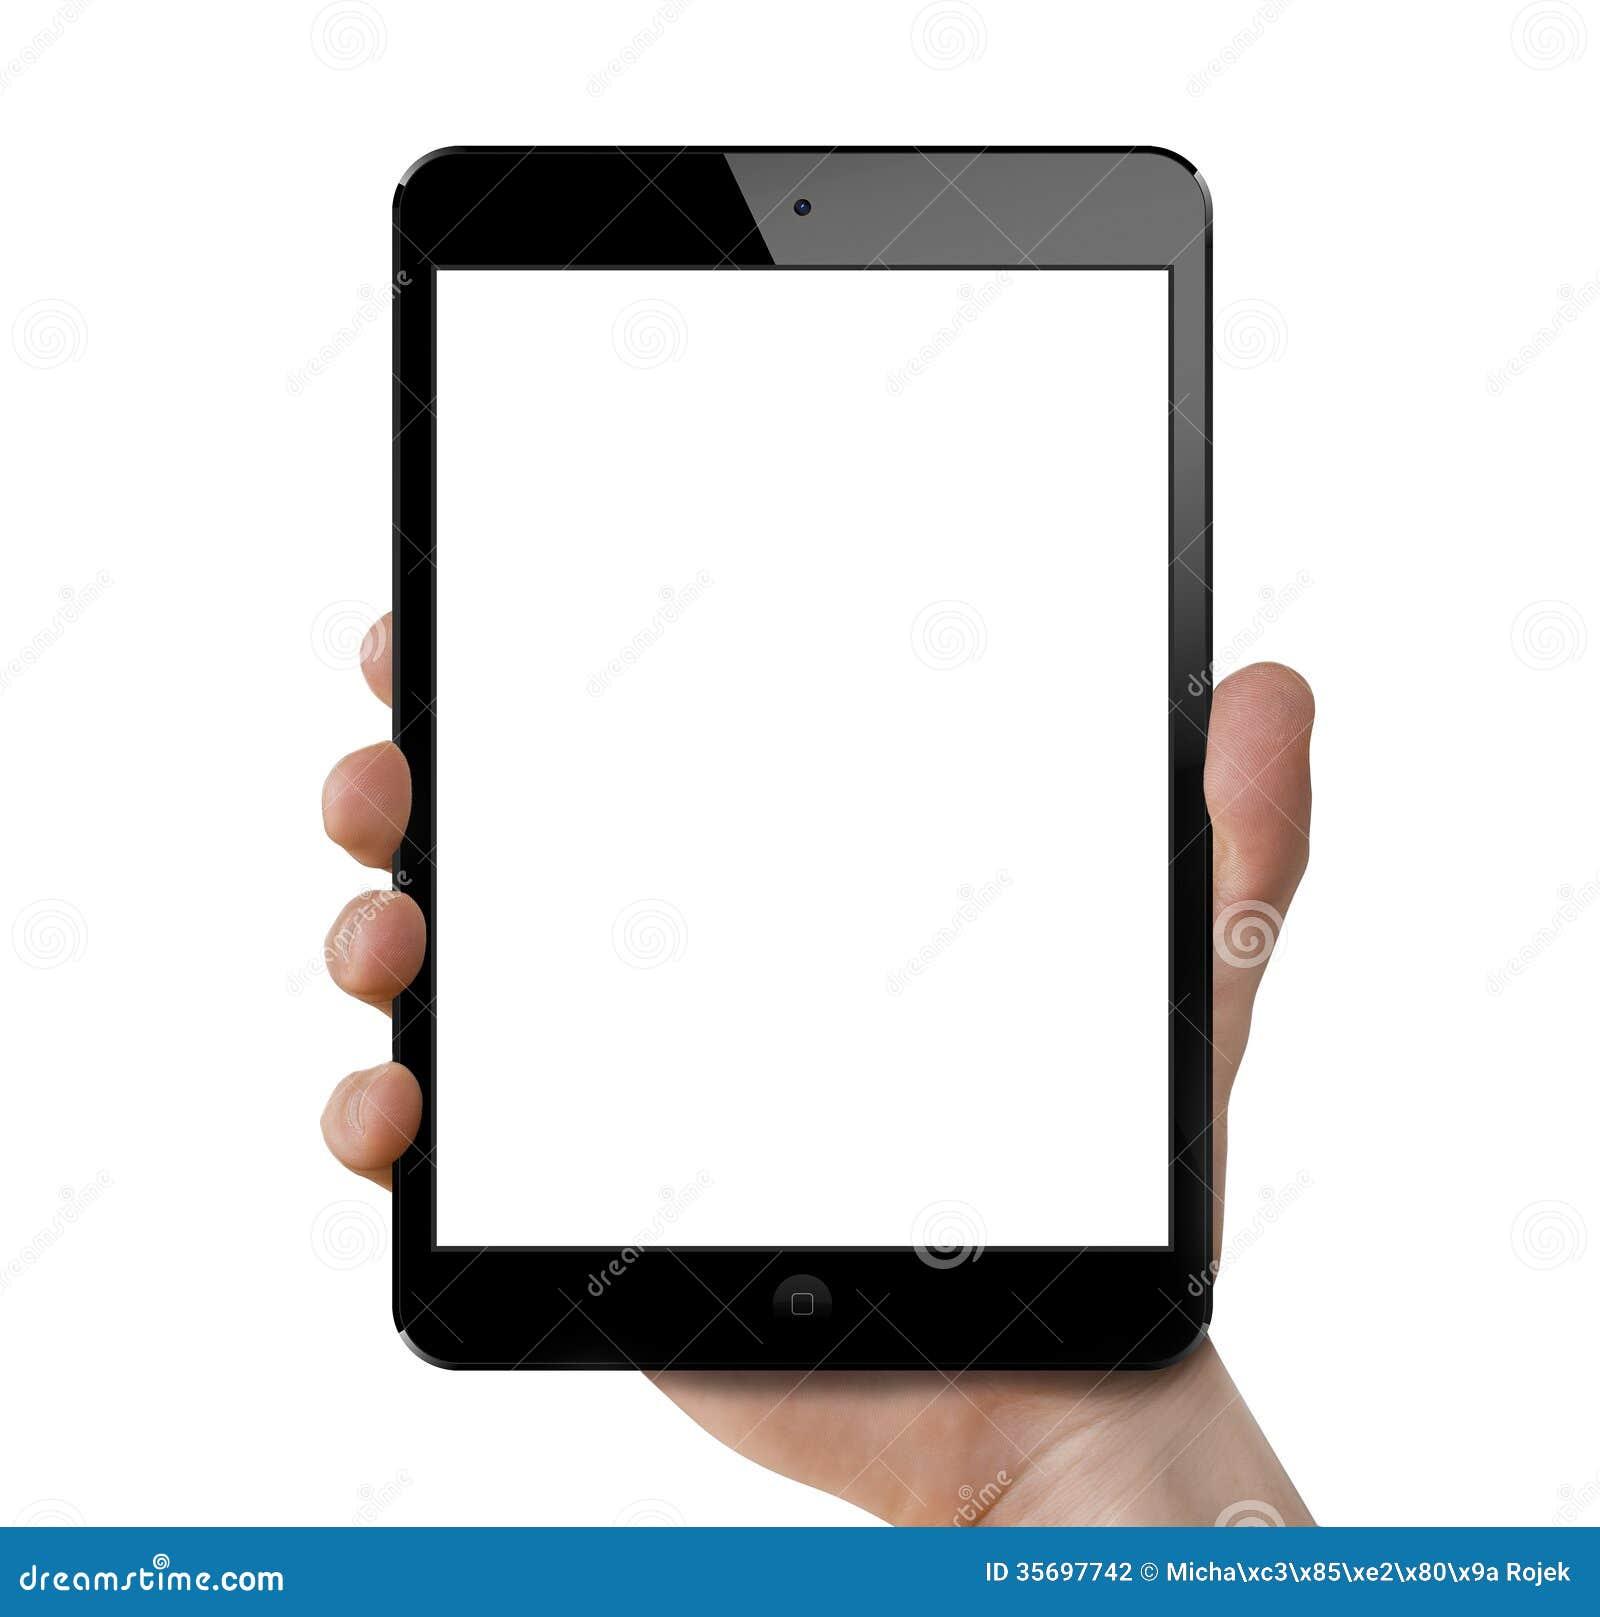 Holding an Ipad mini retina